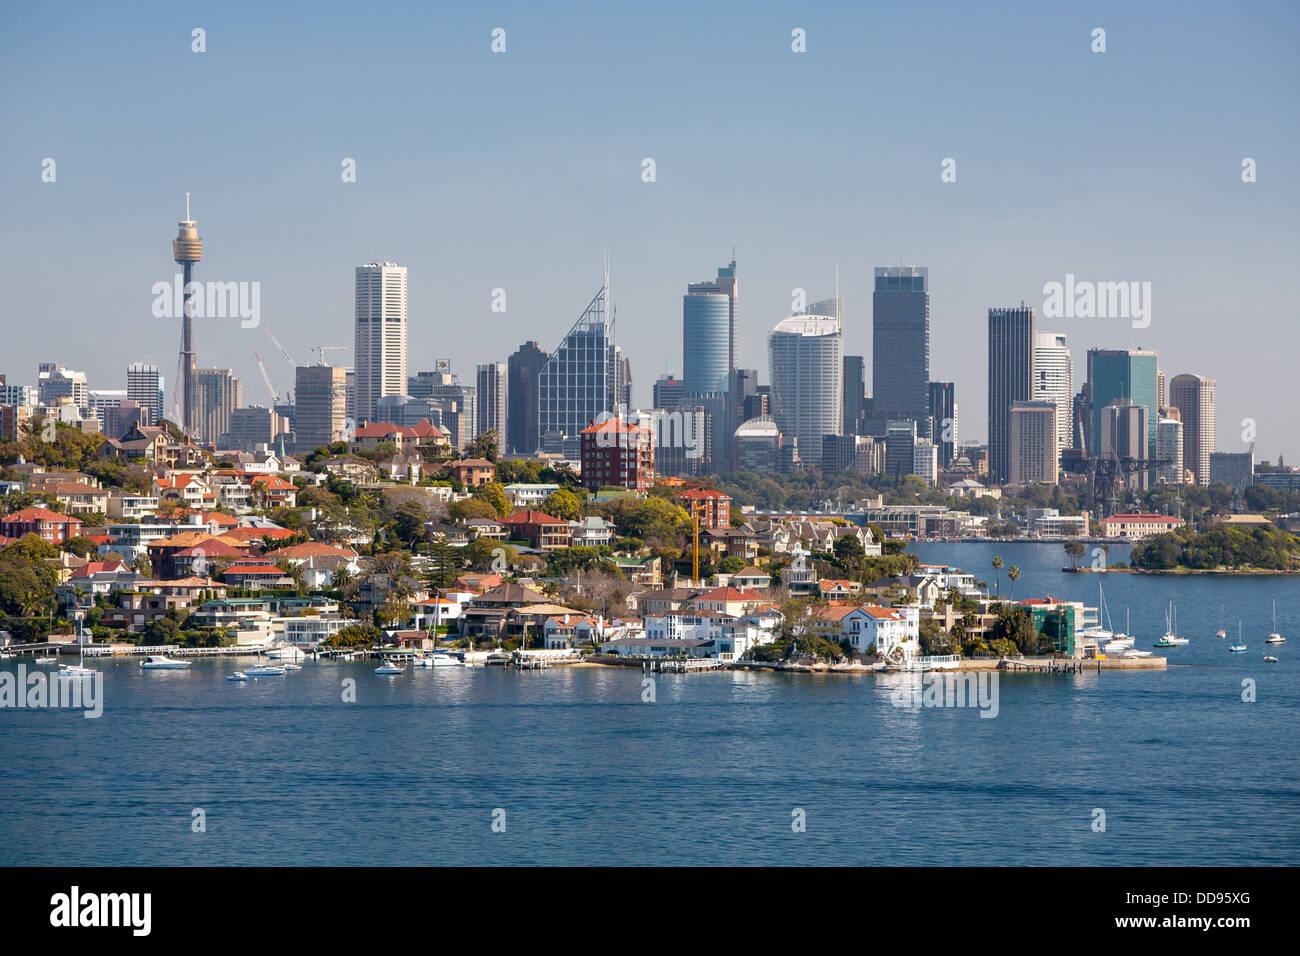 Sydney skyline from Watson's Bay in Sydney, Australia - Stock Image